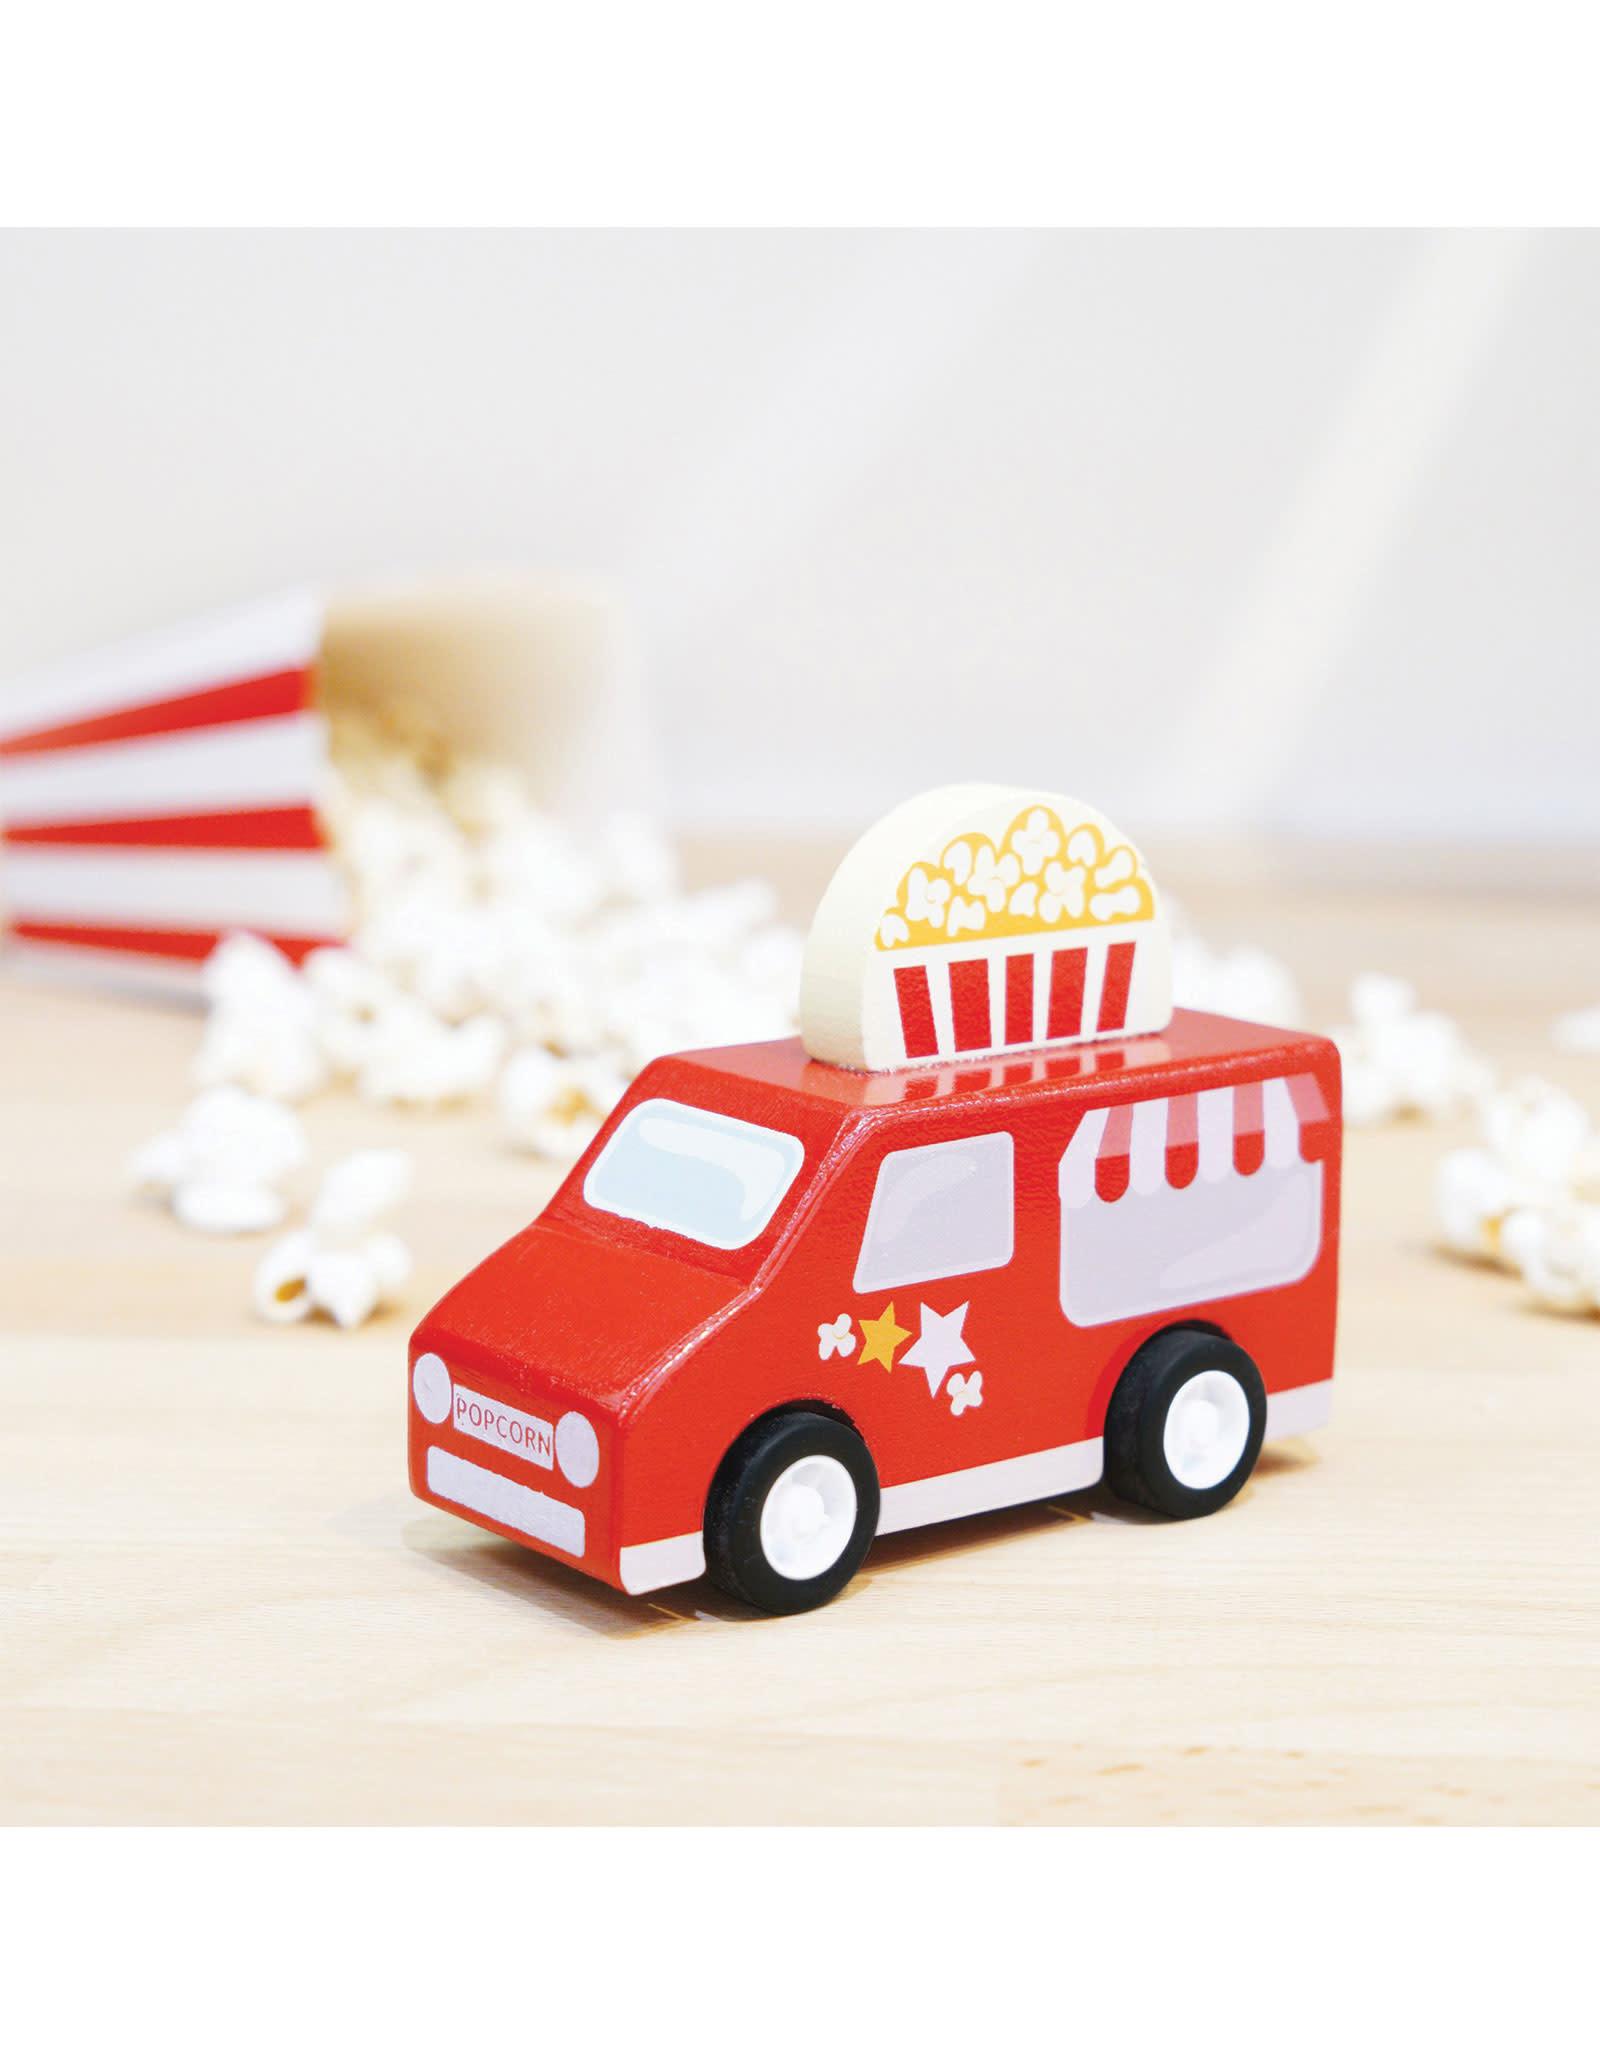 Le Toy Van Popcorn Truck